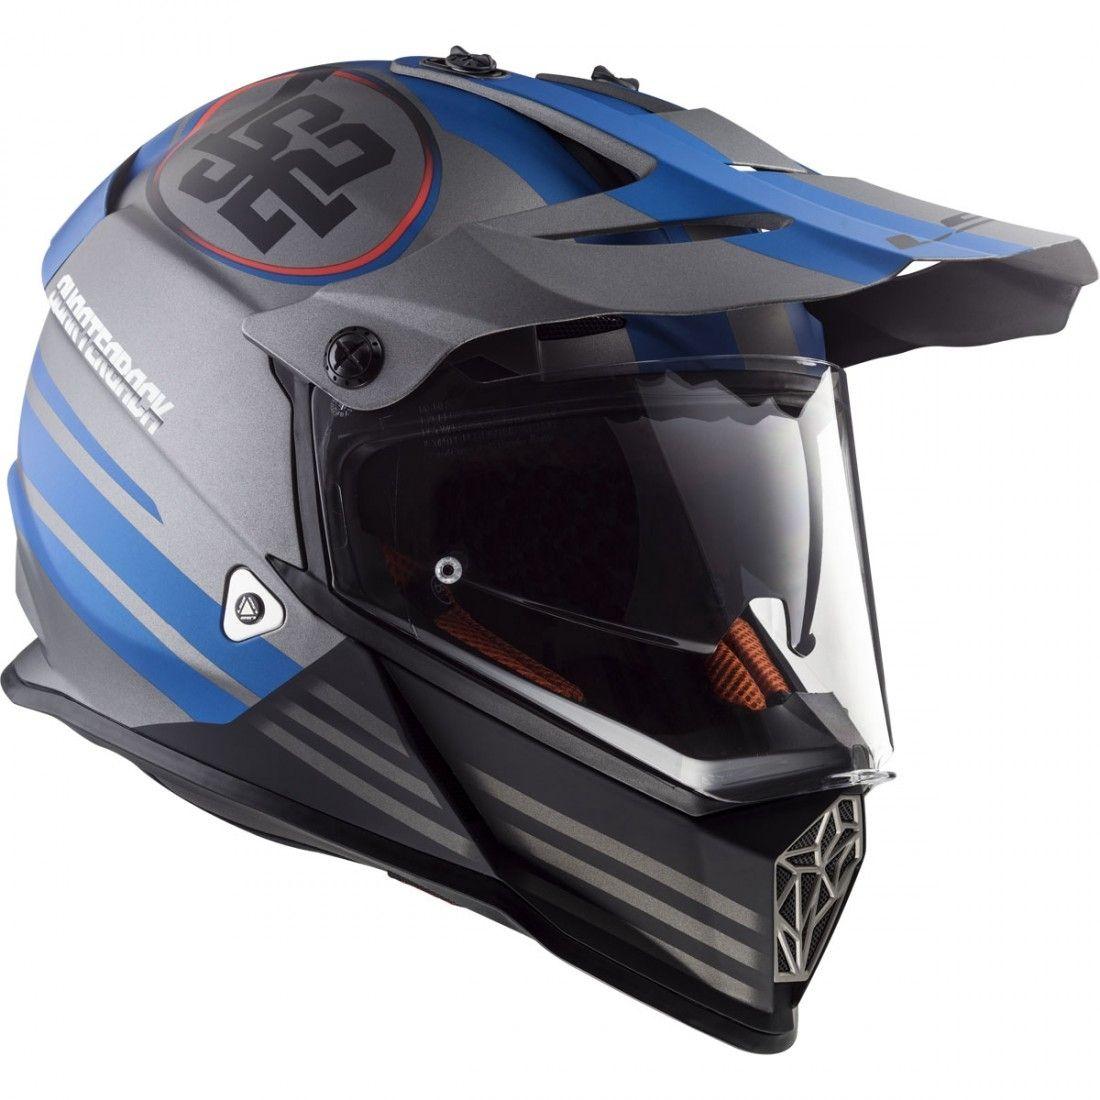 Capacete LS2 MX436 Pionner Quarterback - Cinza/Azul  - Nova Centro Boutique Roupas para Motociclistas